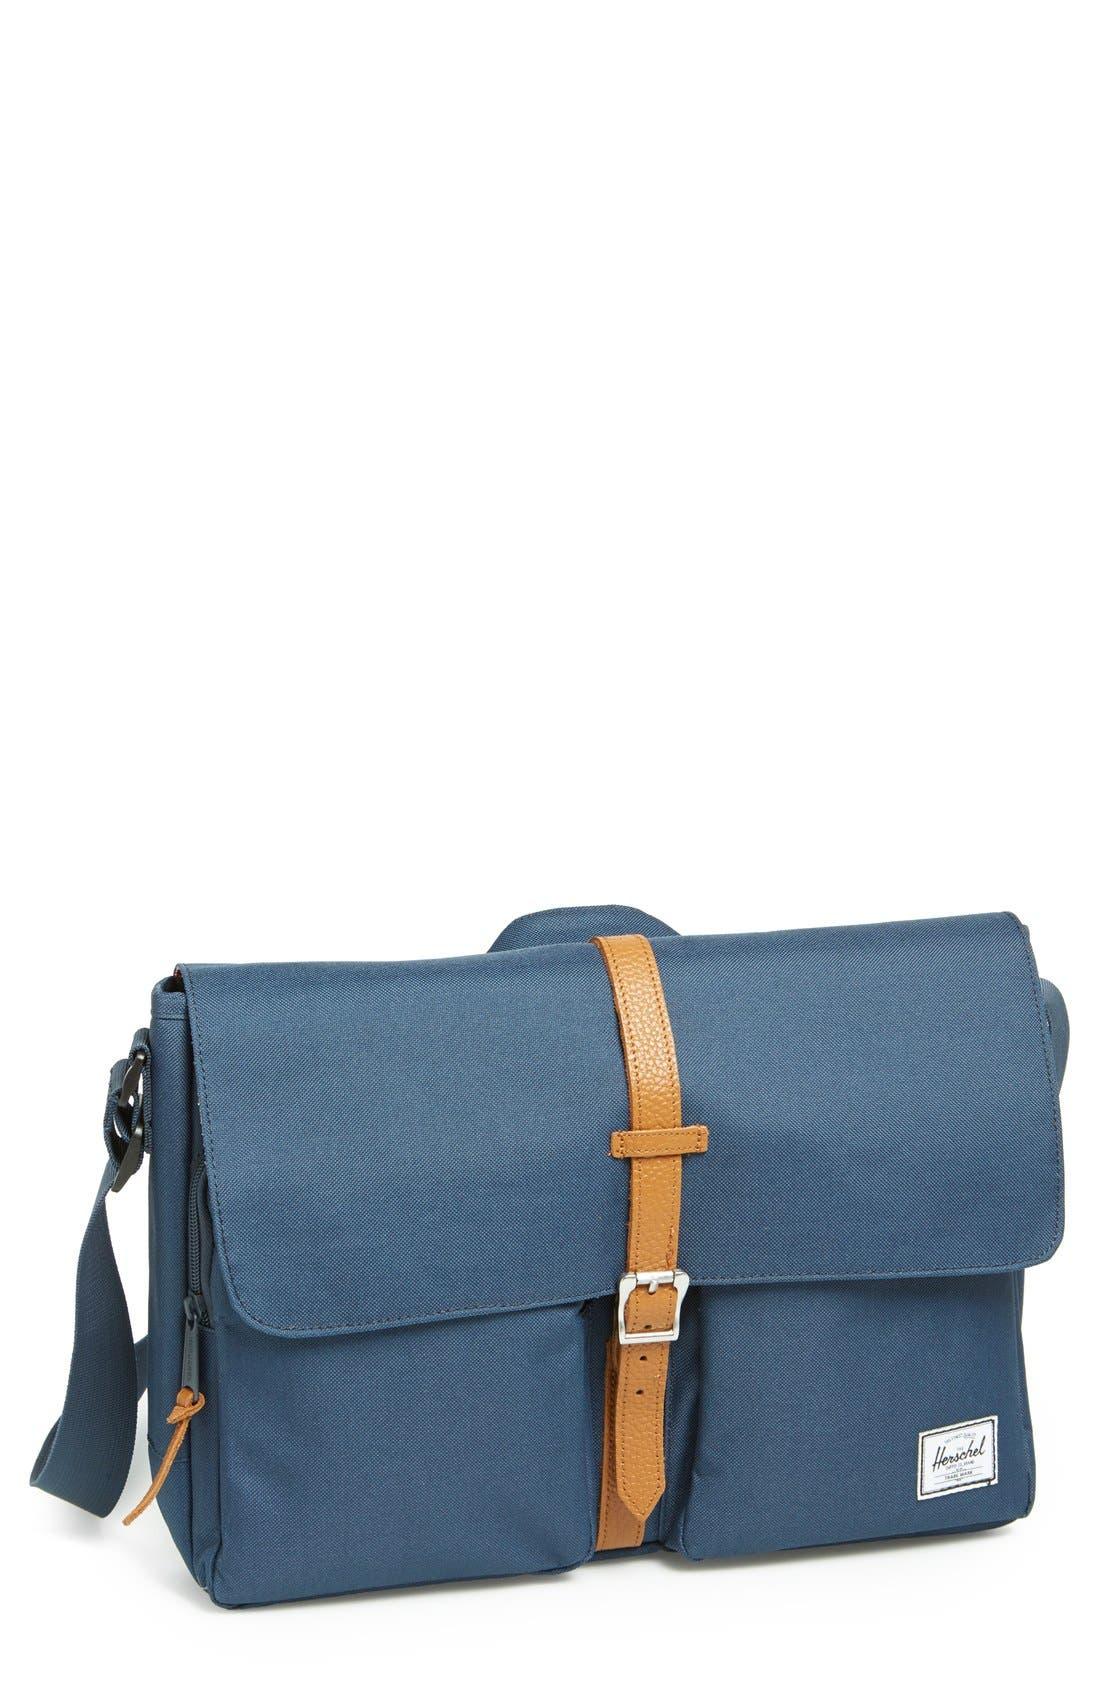 Main Image - Herschel Supply Co. 'Columbia' Messenger Bag